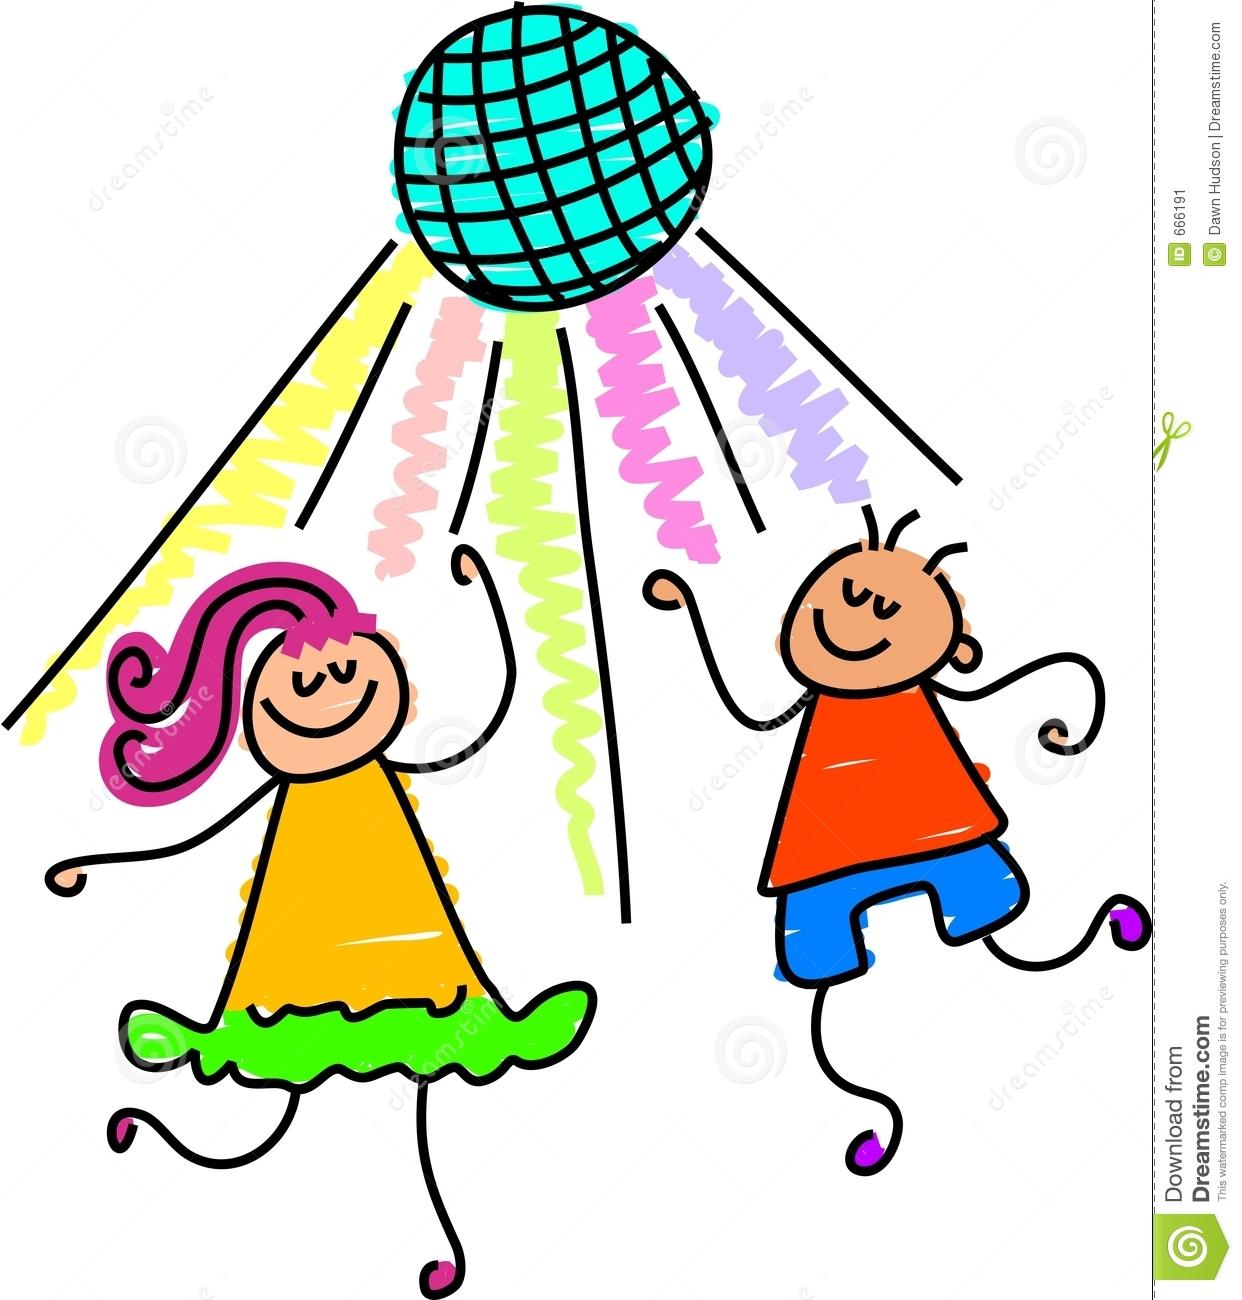 Dancing clipart children's. Children free download best